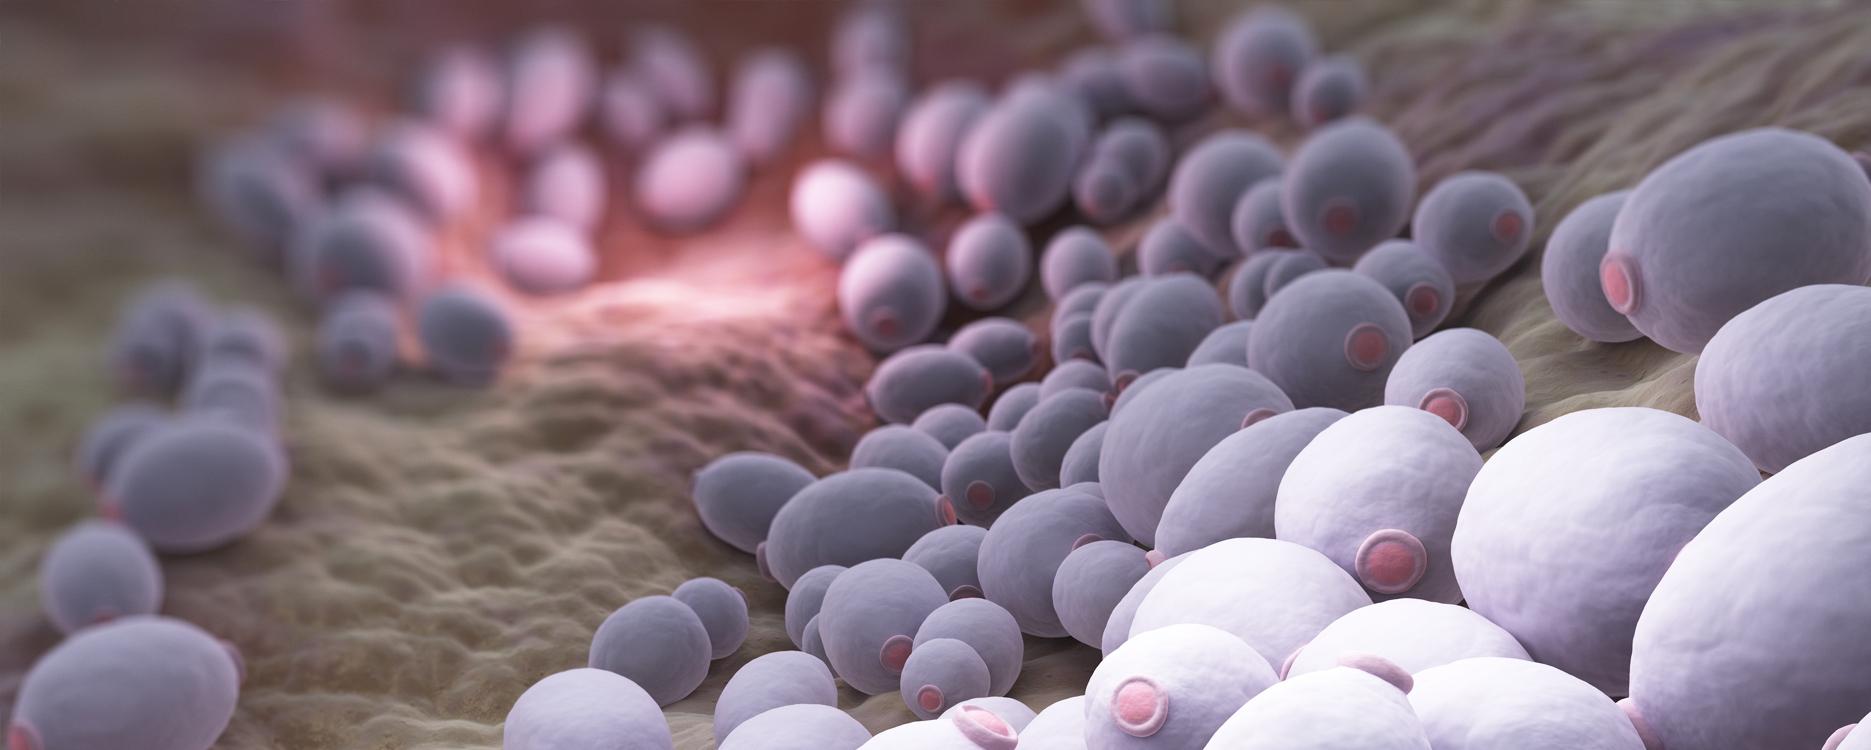 mycose vagunale symptome